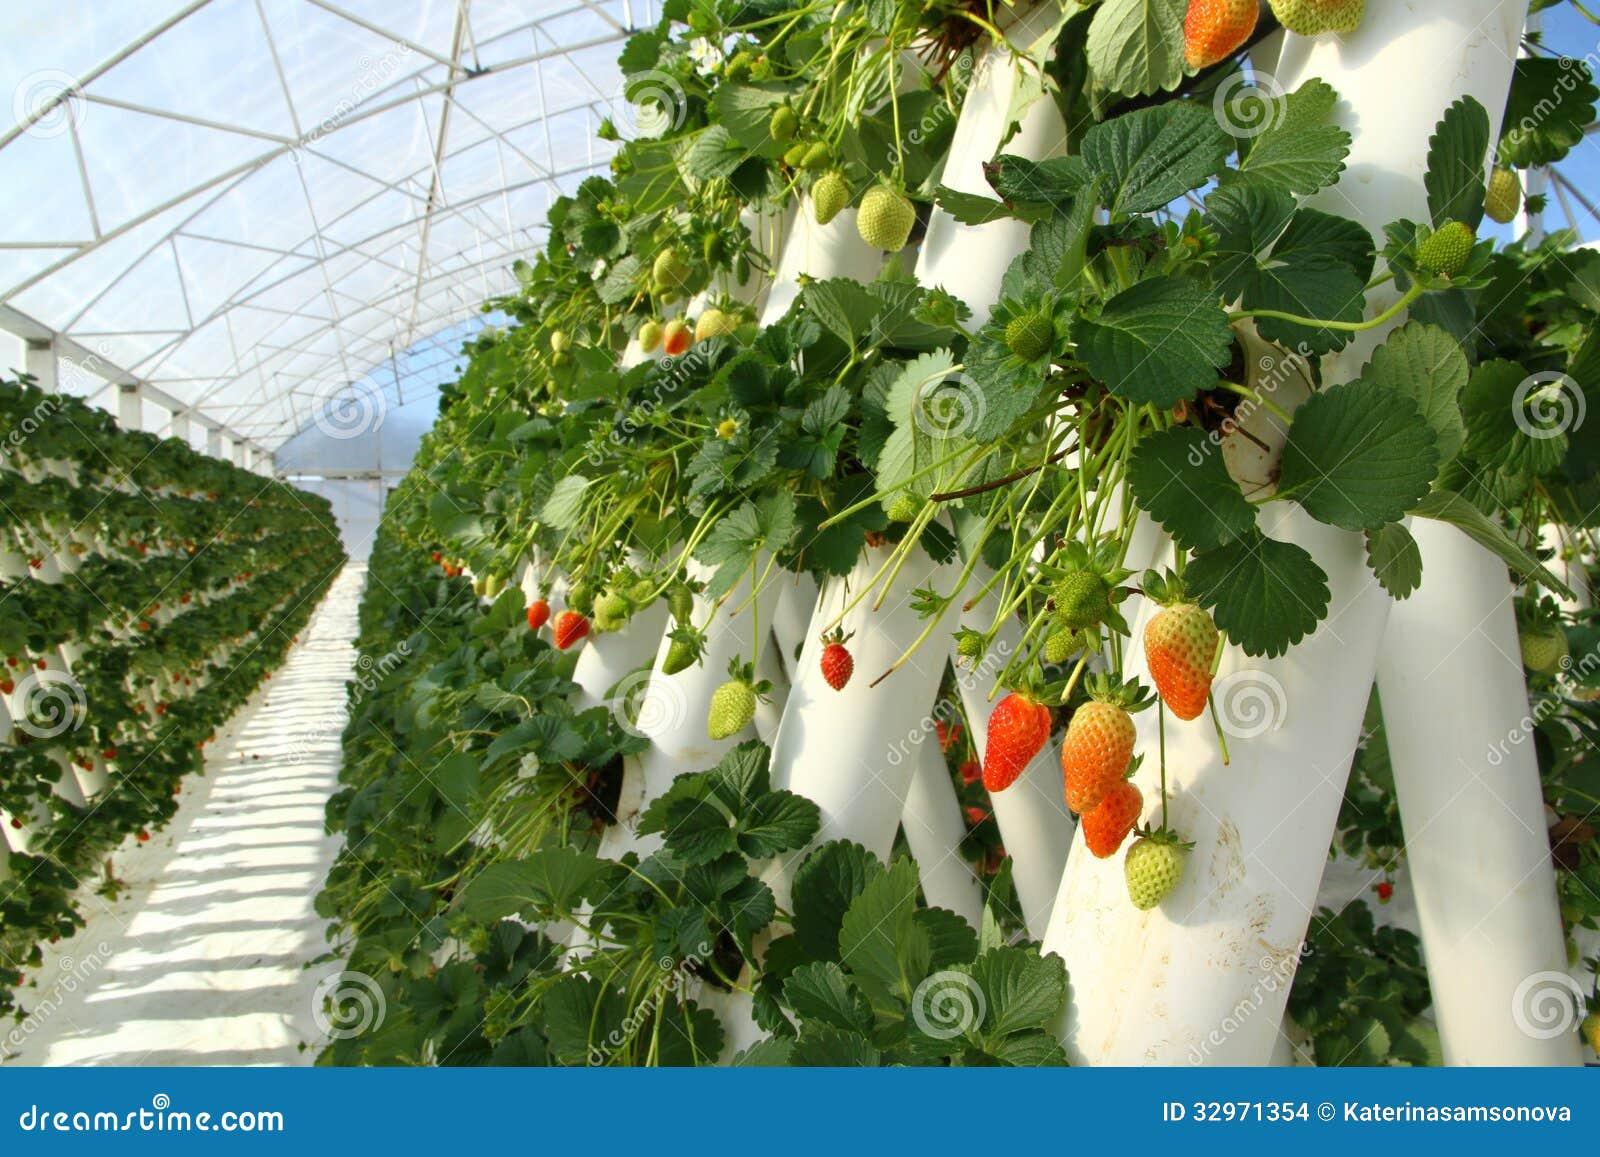 Strawberry farming business plan